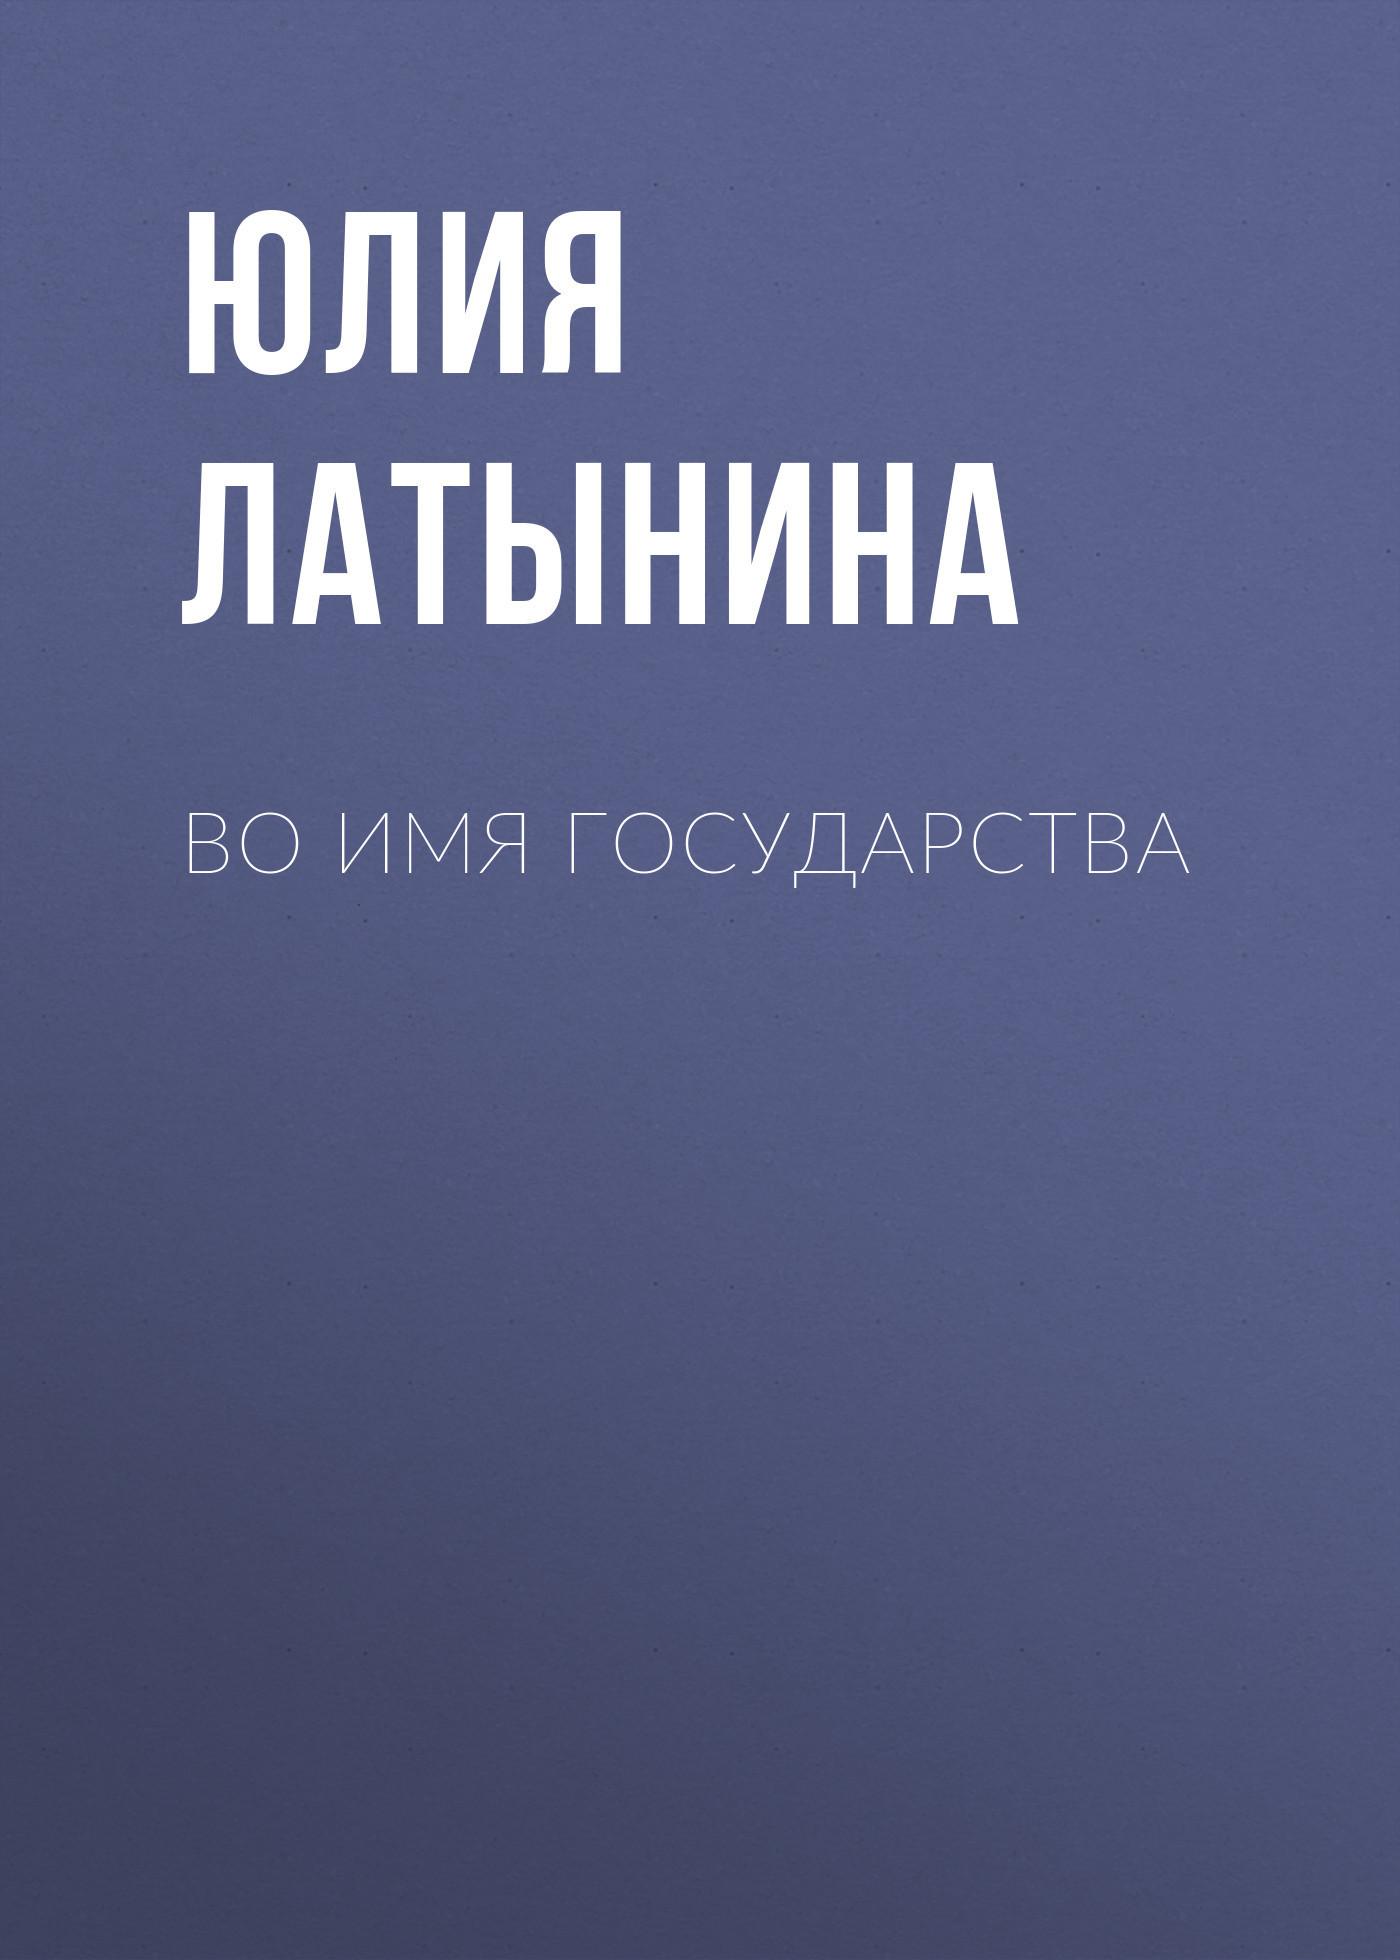 Юлия Латынина - Во имя государства